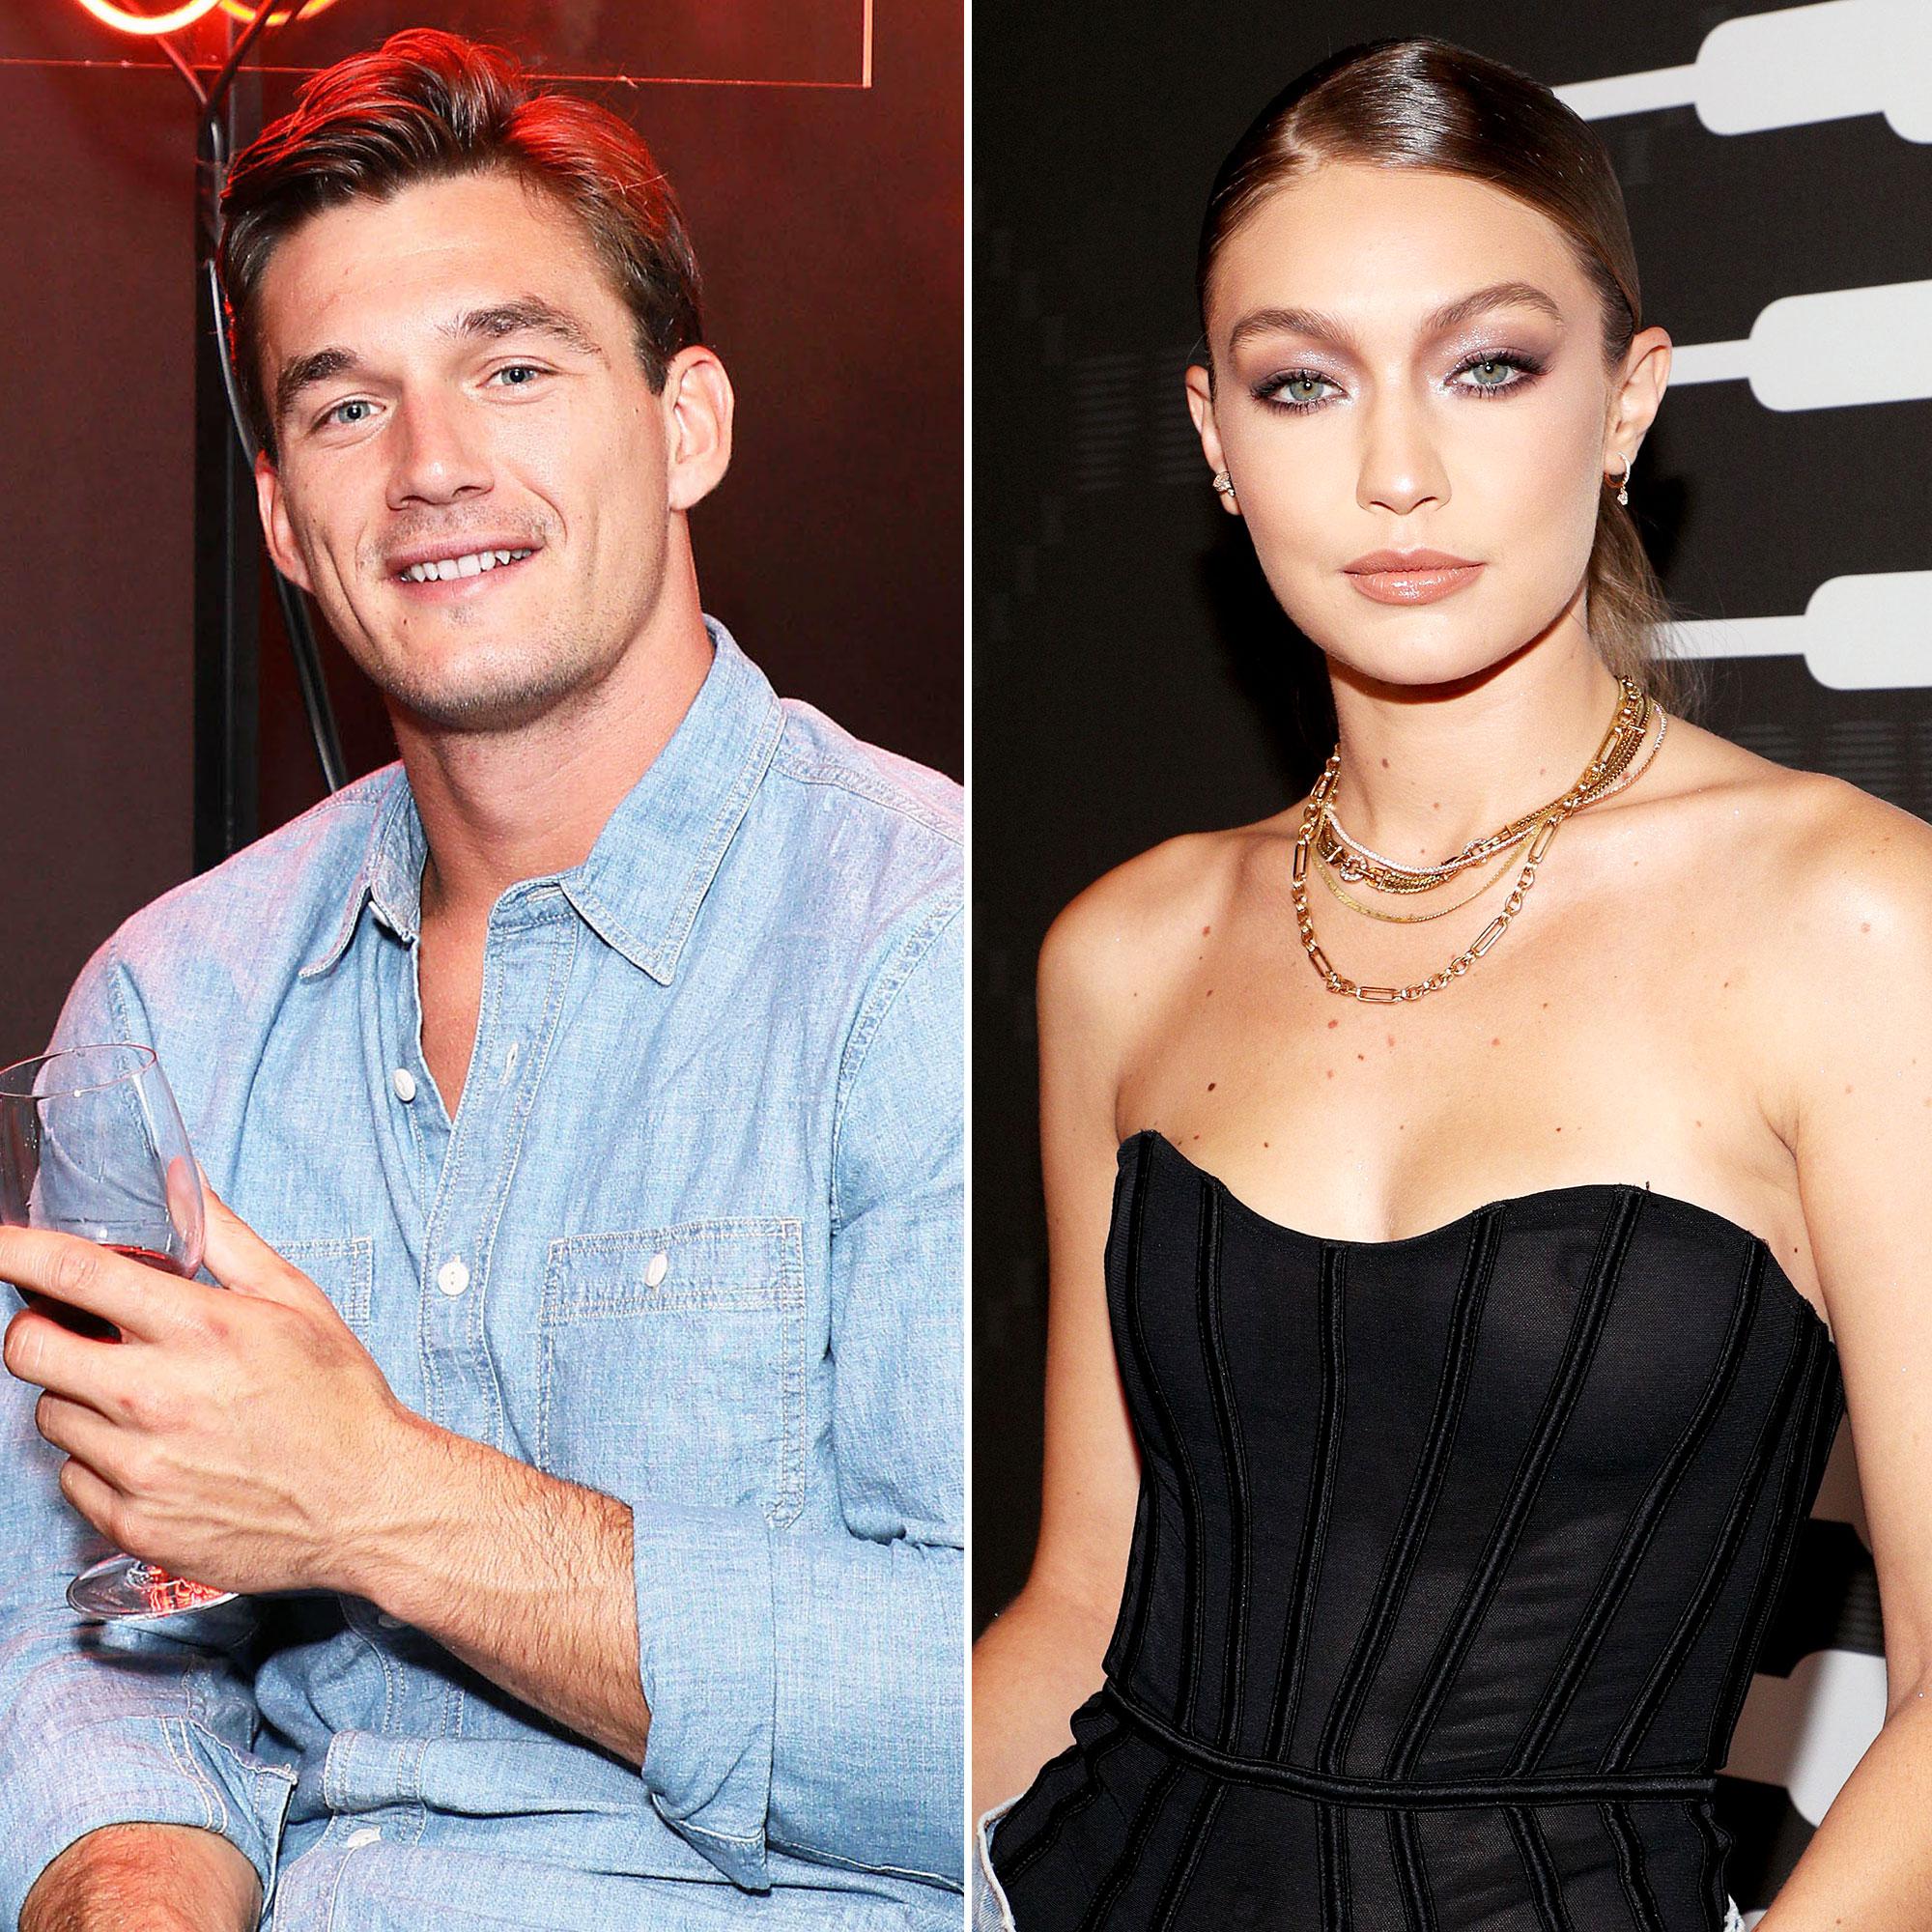 Tyler Cameron Breaks Silence on Gigi Hadid Romance But Claims They AremJust Friends